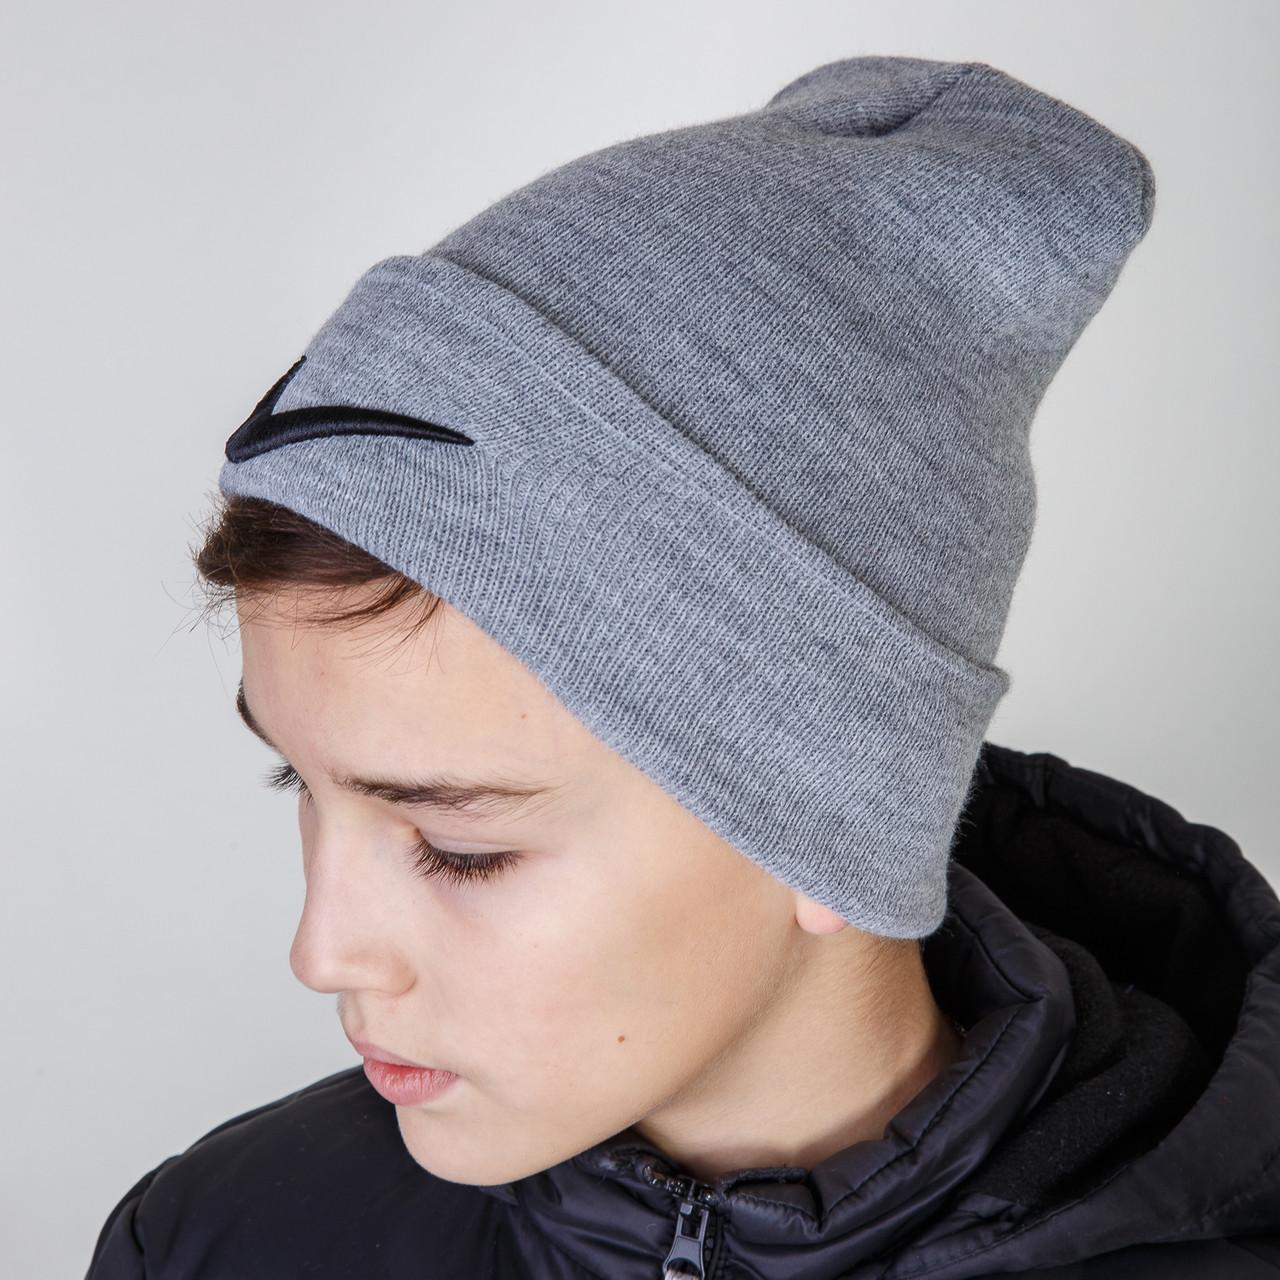 Спортивная зимняя шапка Nike (реплика) для мальчика оптом - Артикул 2902